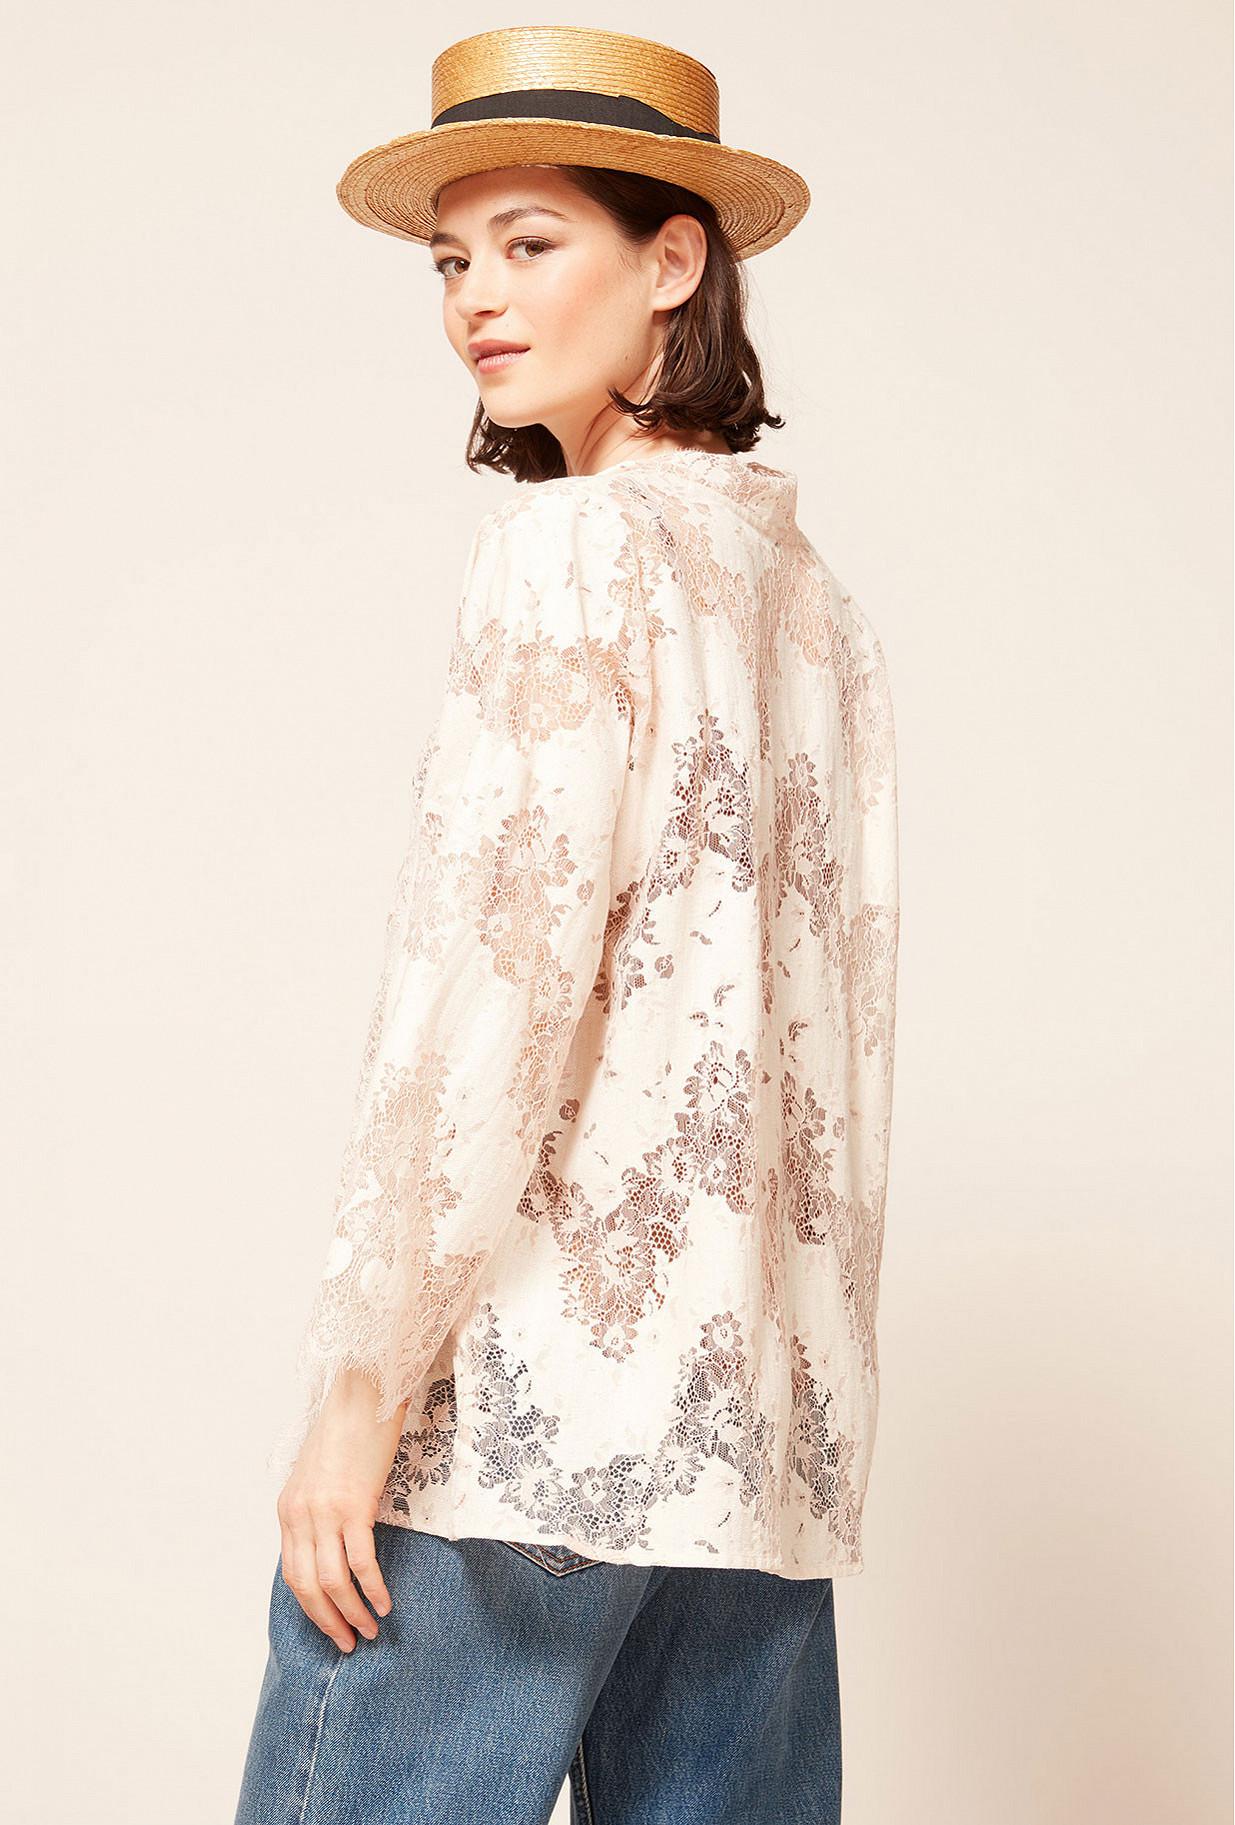 Powder Kimono Alix Mes Demoiselles Paris